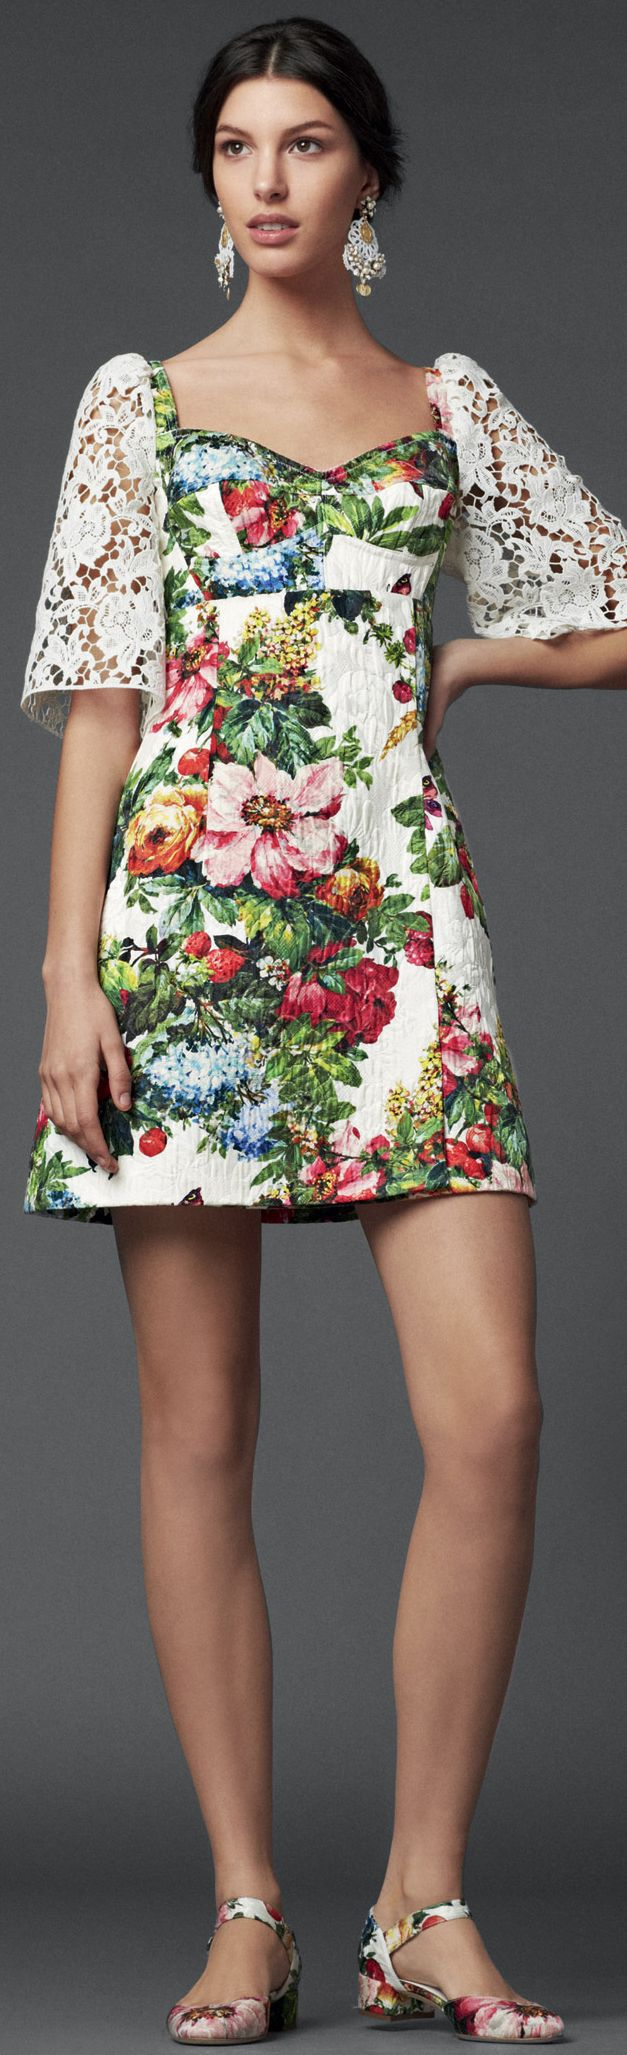 Dolce & Gabbana F/W 2014 | The House of Beccaria#